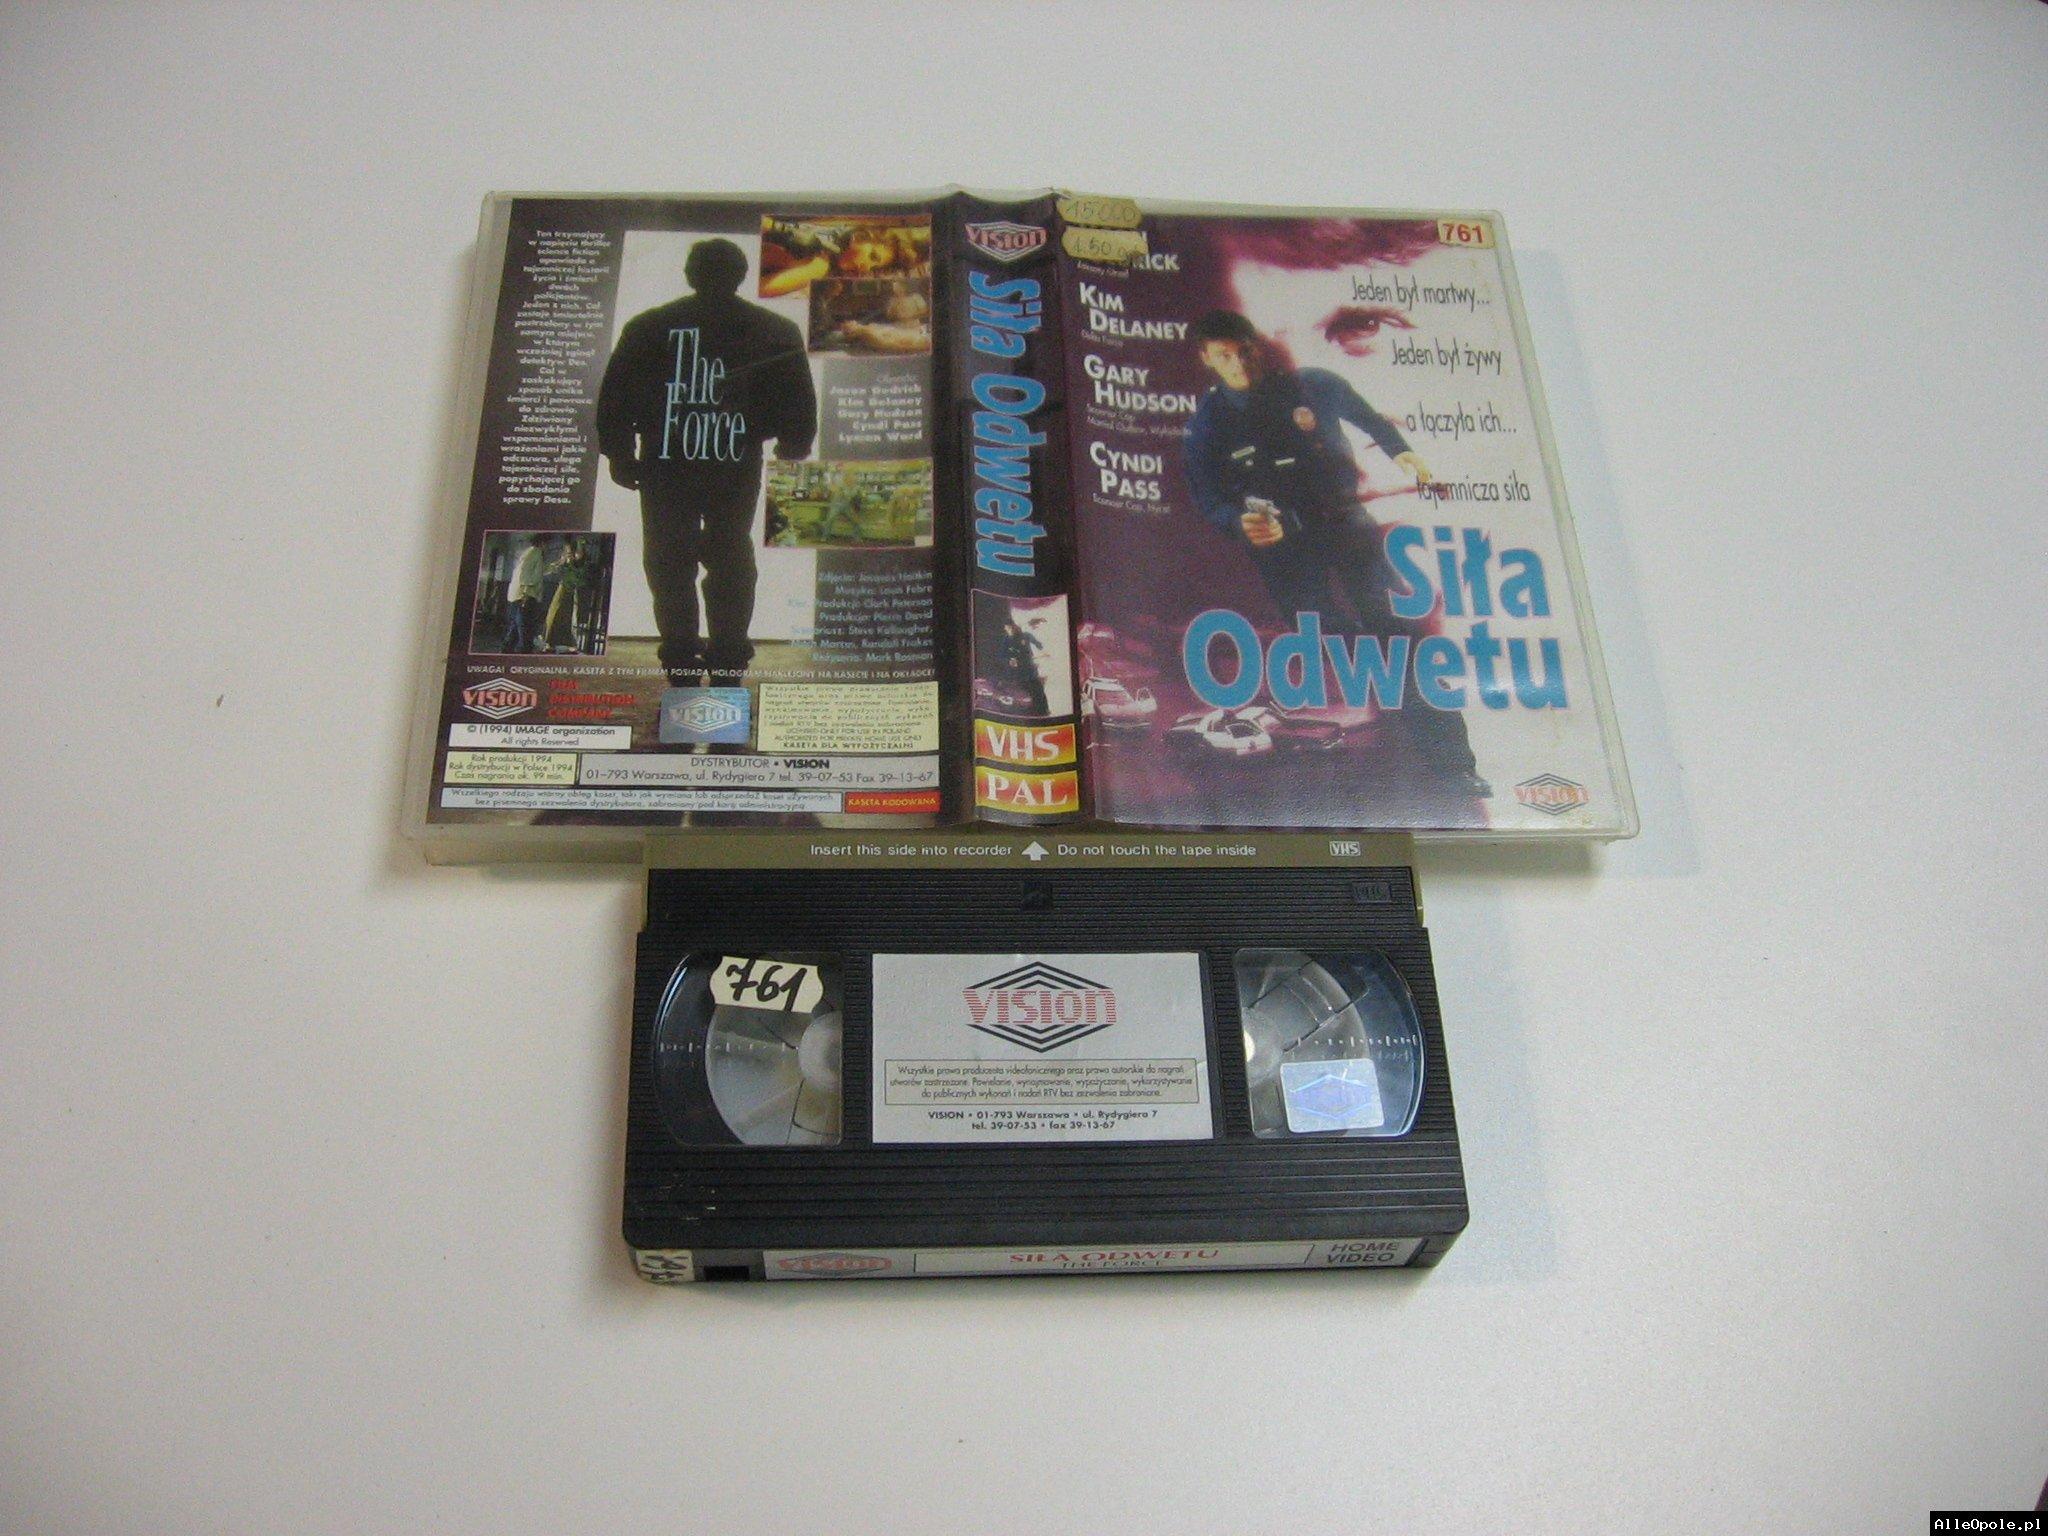 SIŁA ODWETU - VHS Kaseta Video - Opole 1822